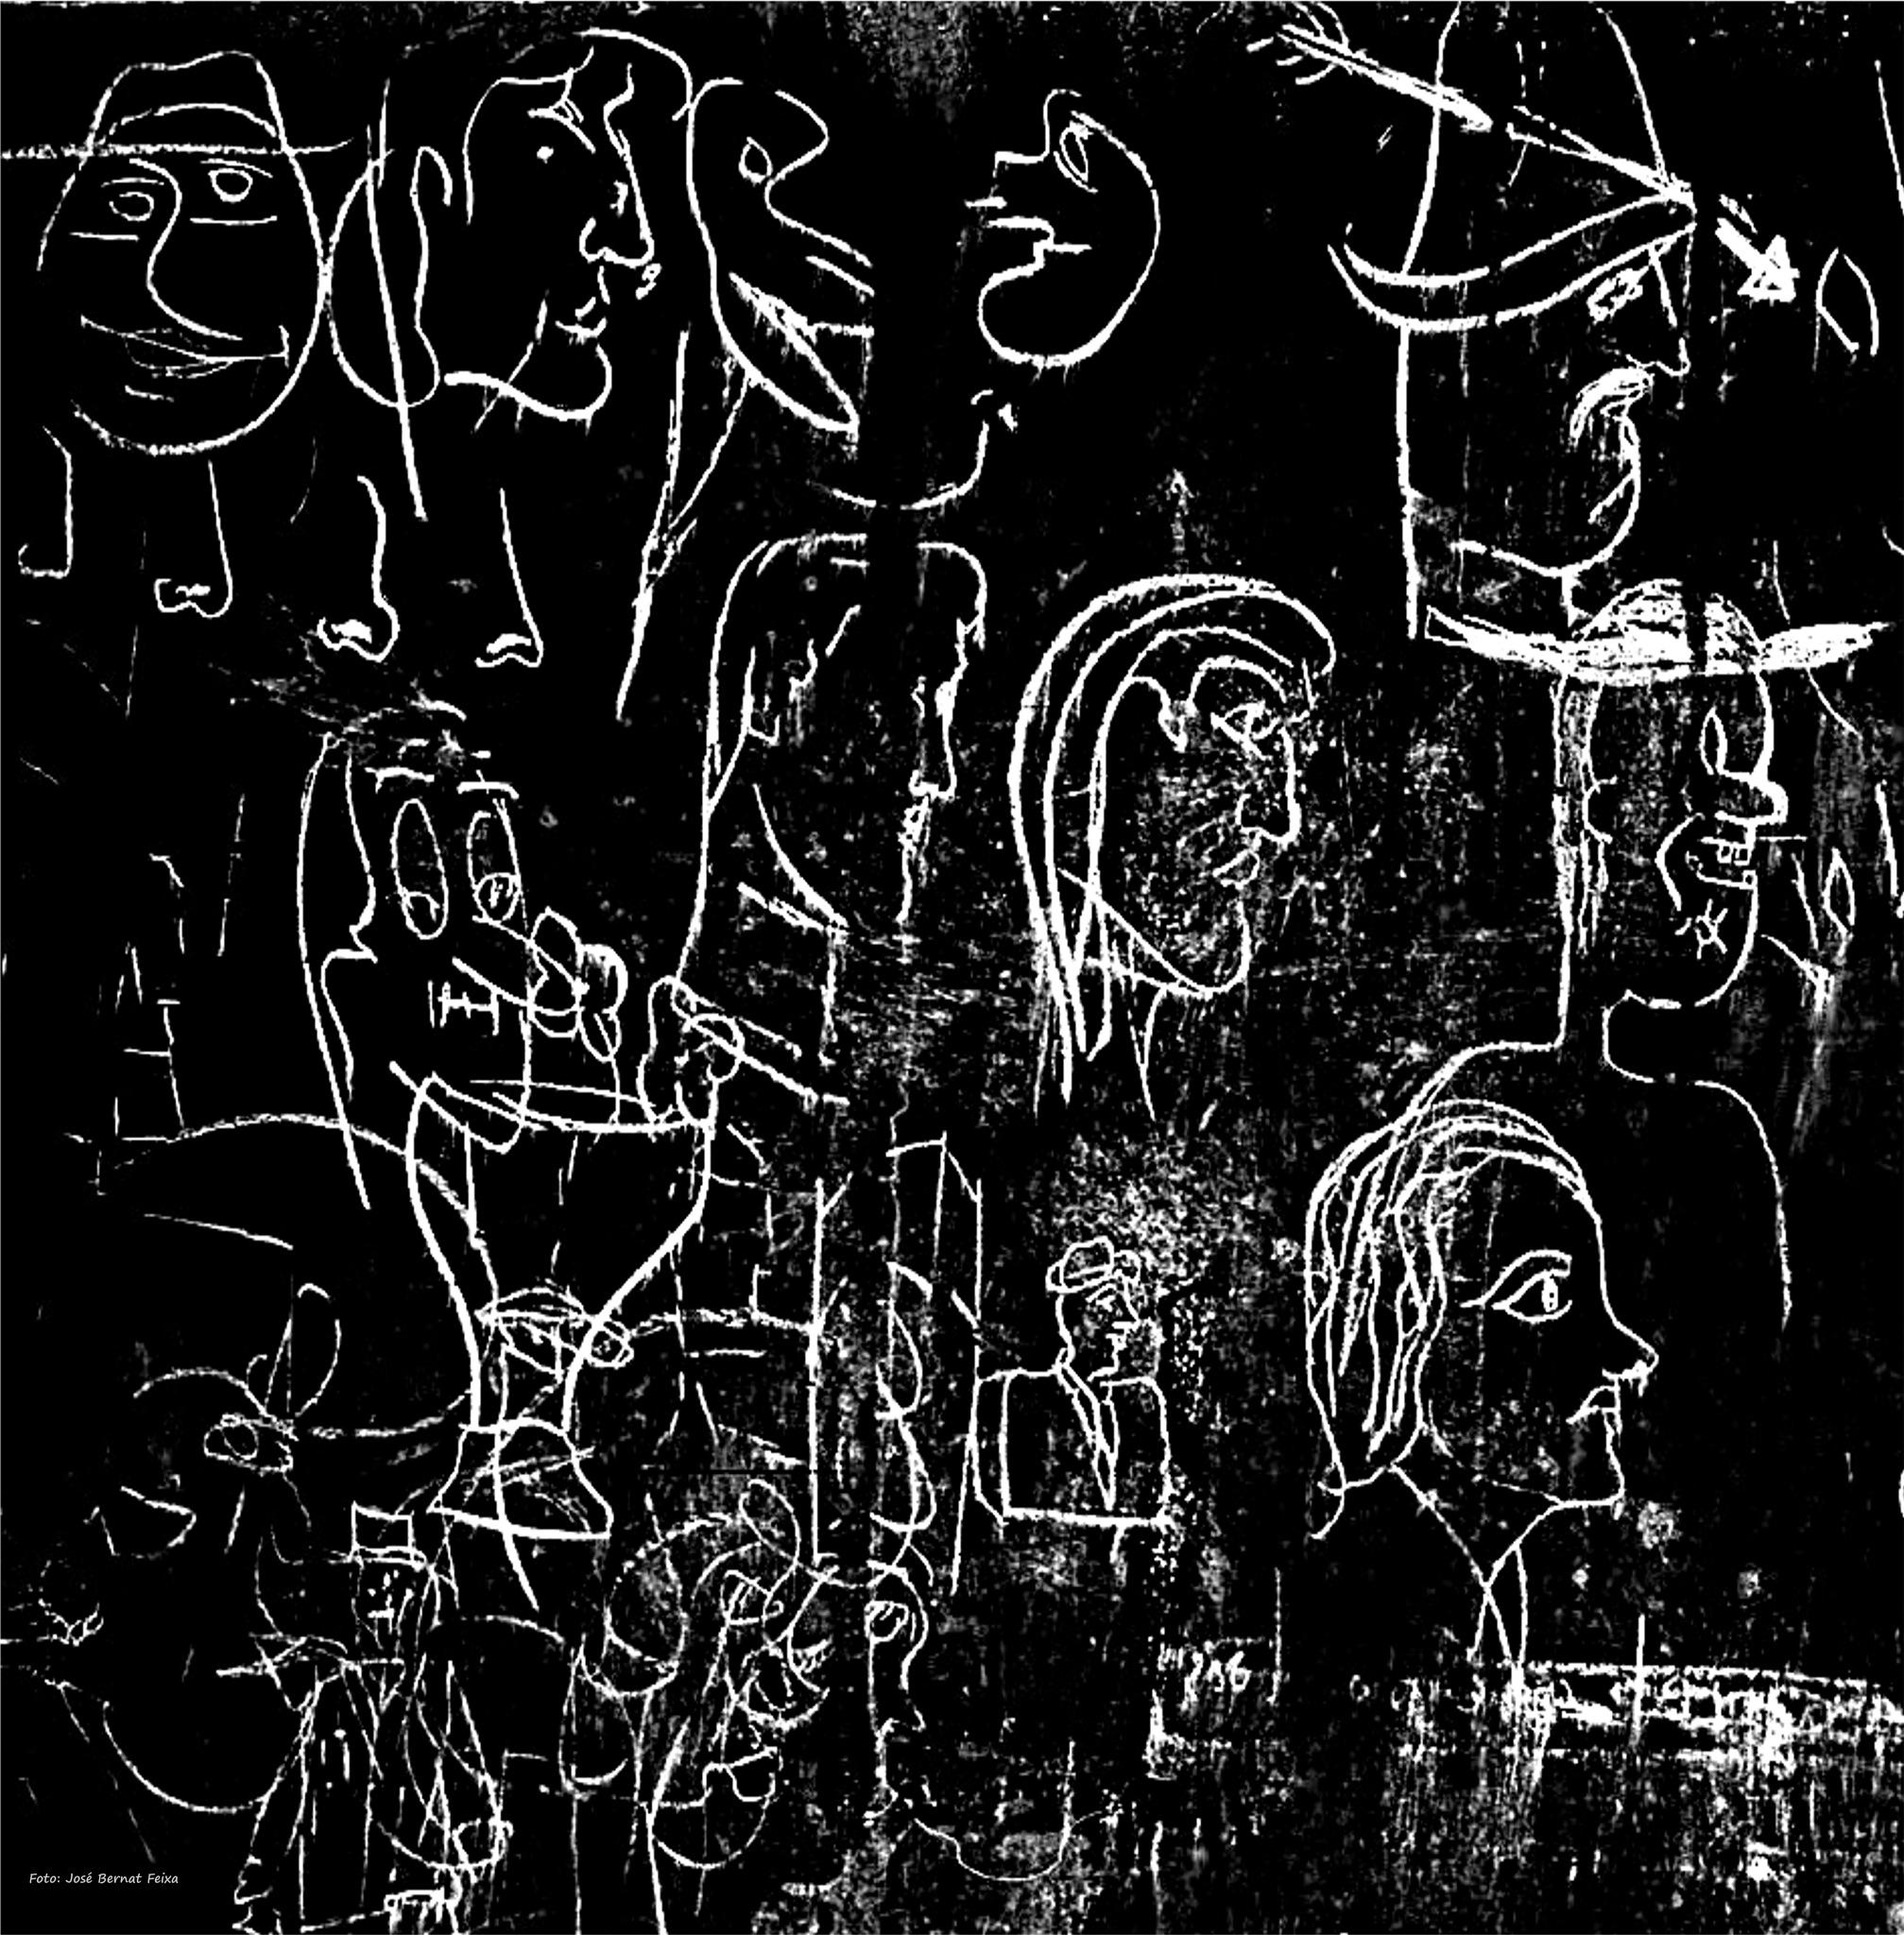 GRAFITTIS; GRAFITTI (60's) by José Bernat Feixa